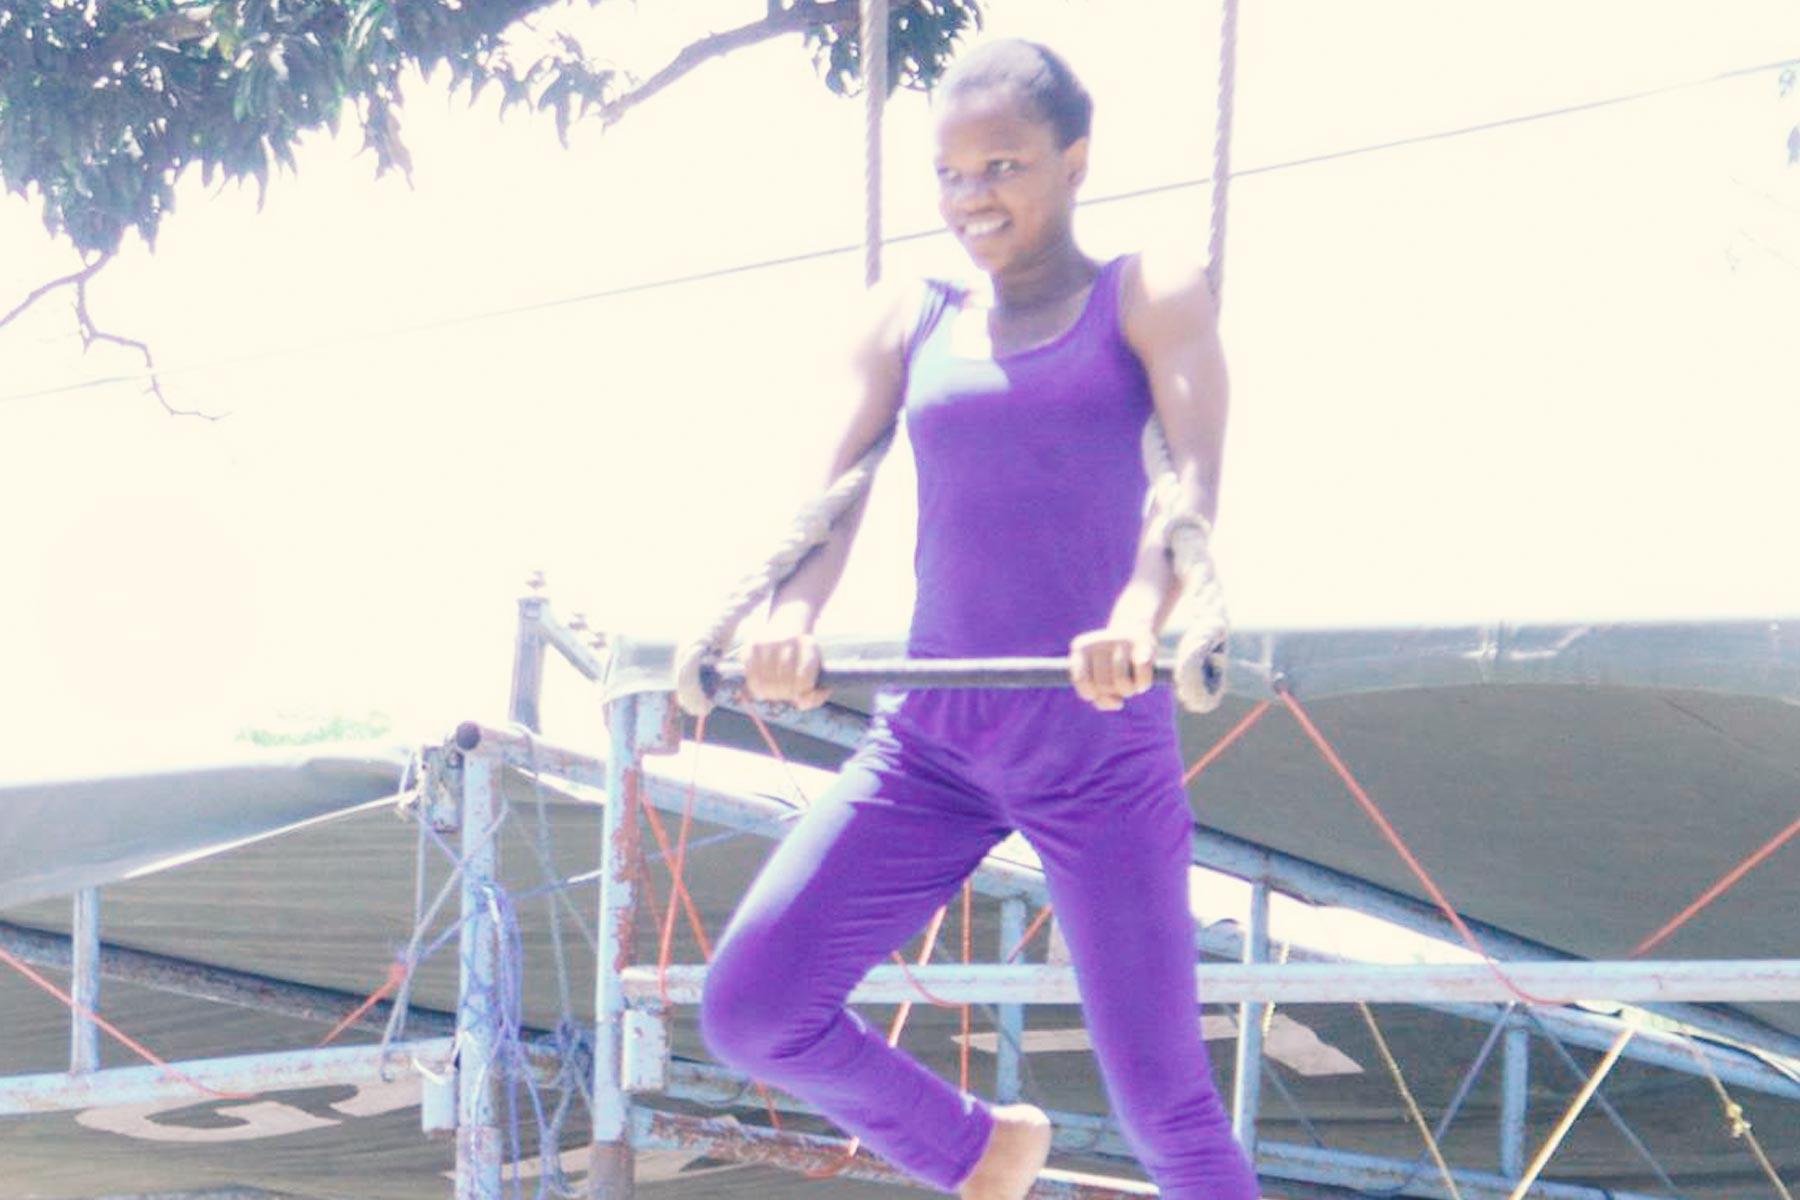 FCA_Trainer_Mwajabu_01